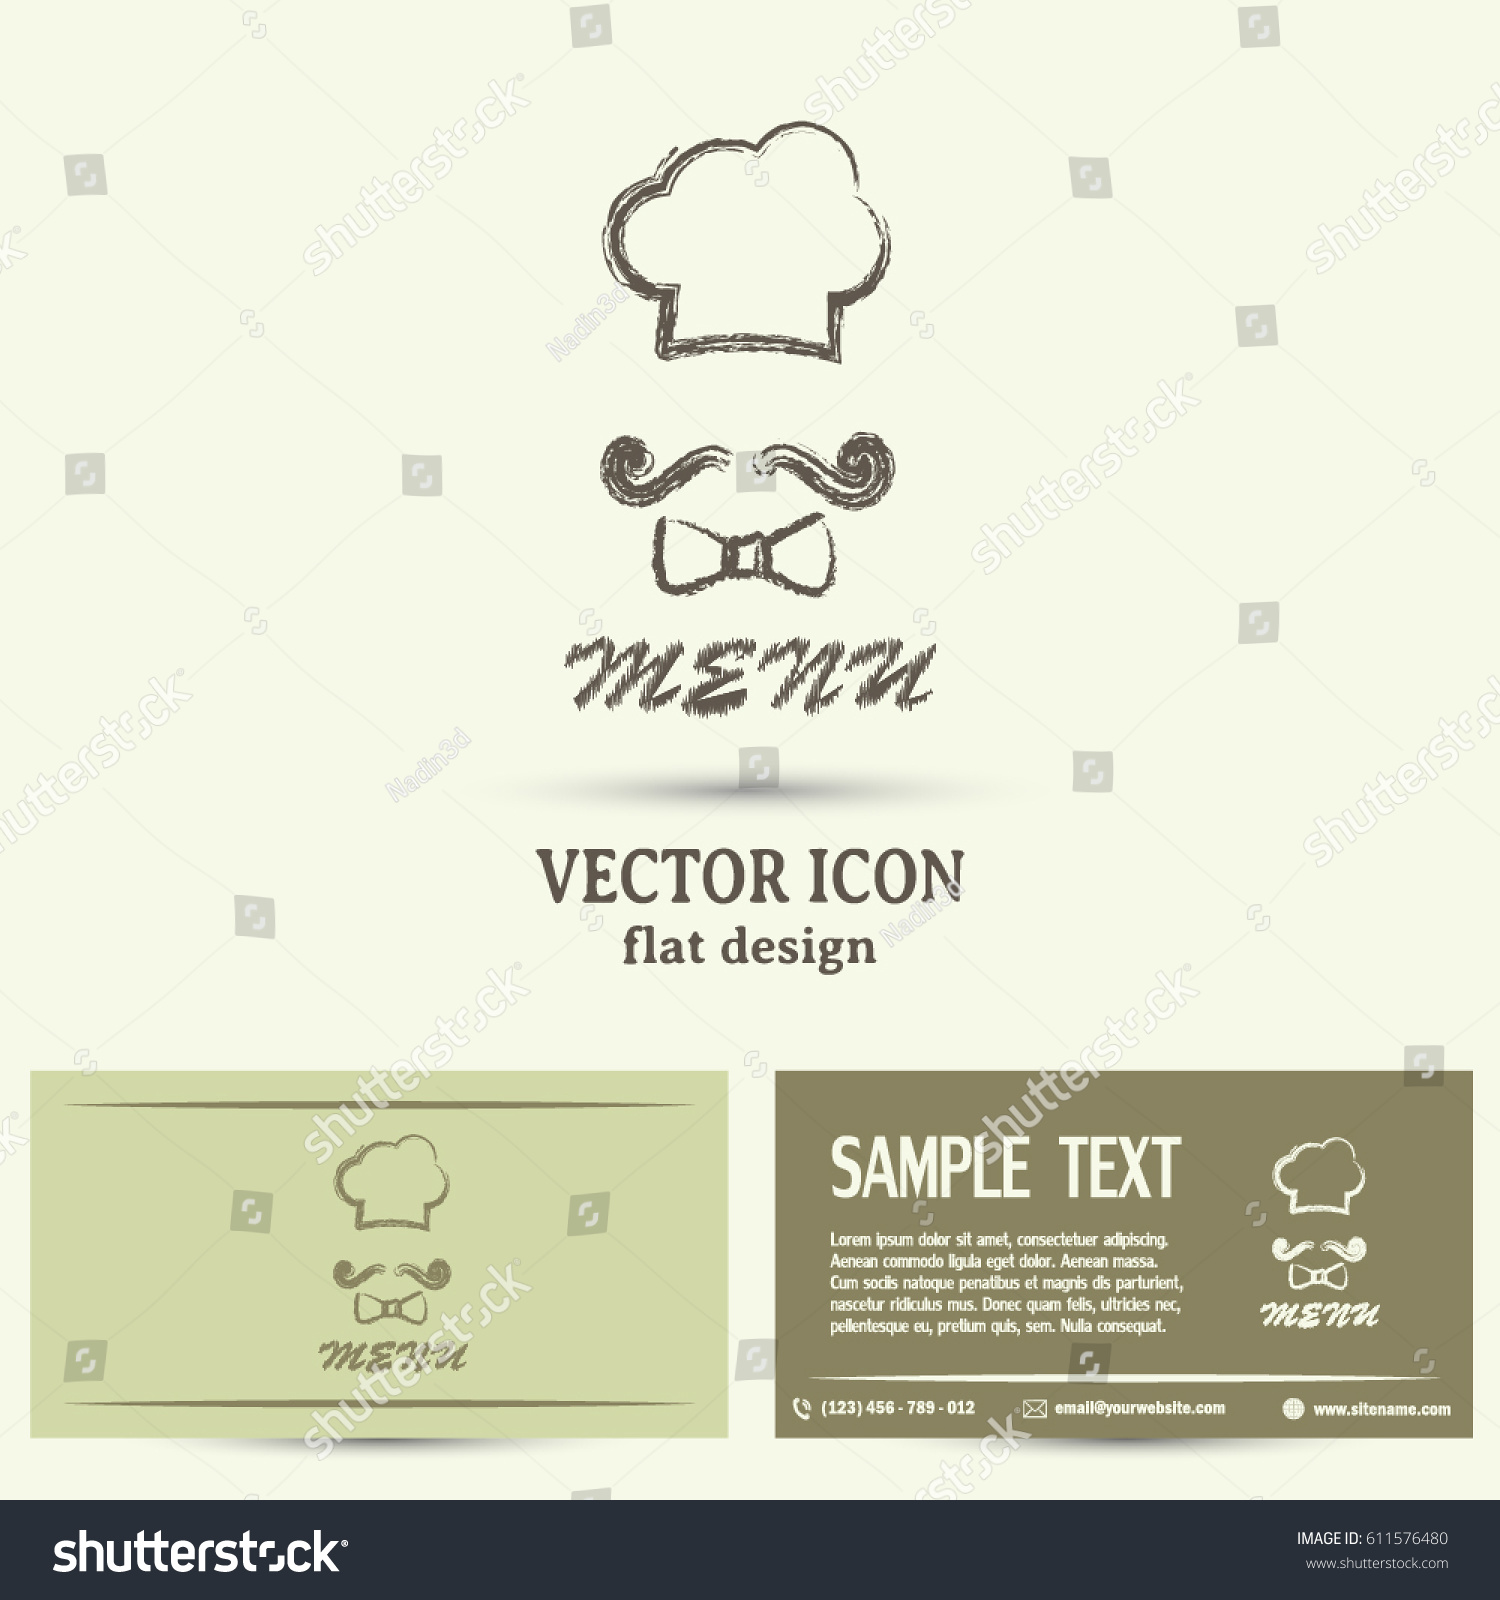 Business Cards Design Chef Hat Big Stock Vector 611576480 - Shutterstock